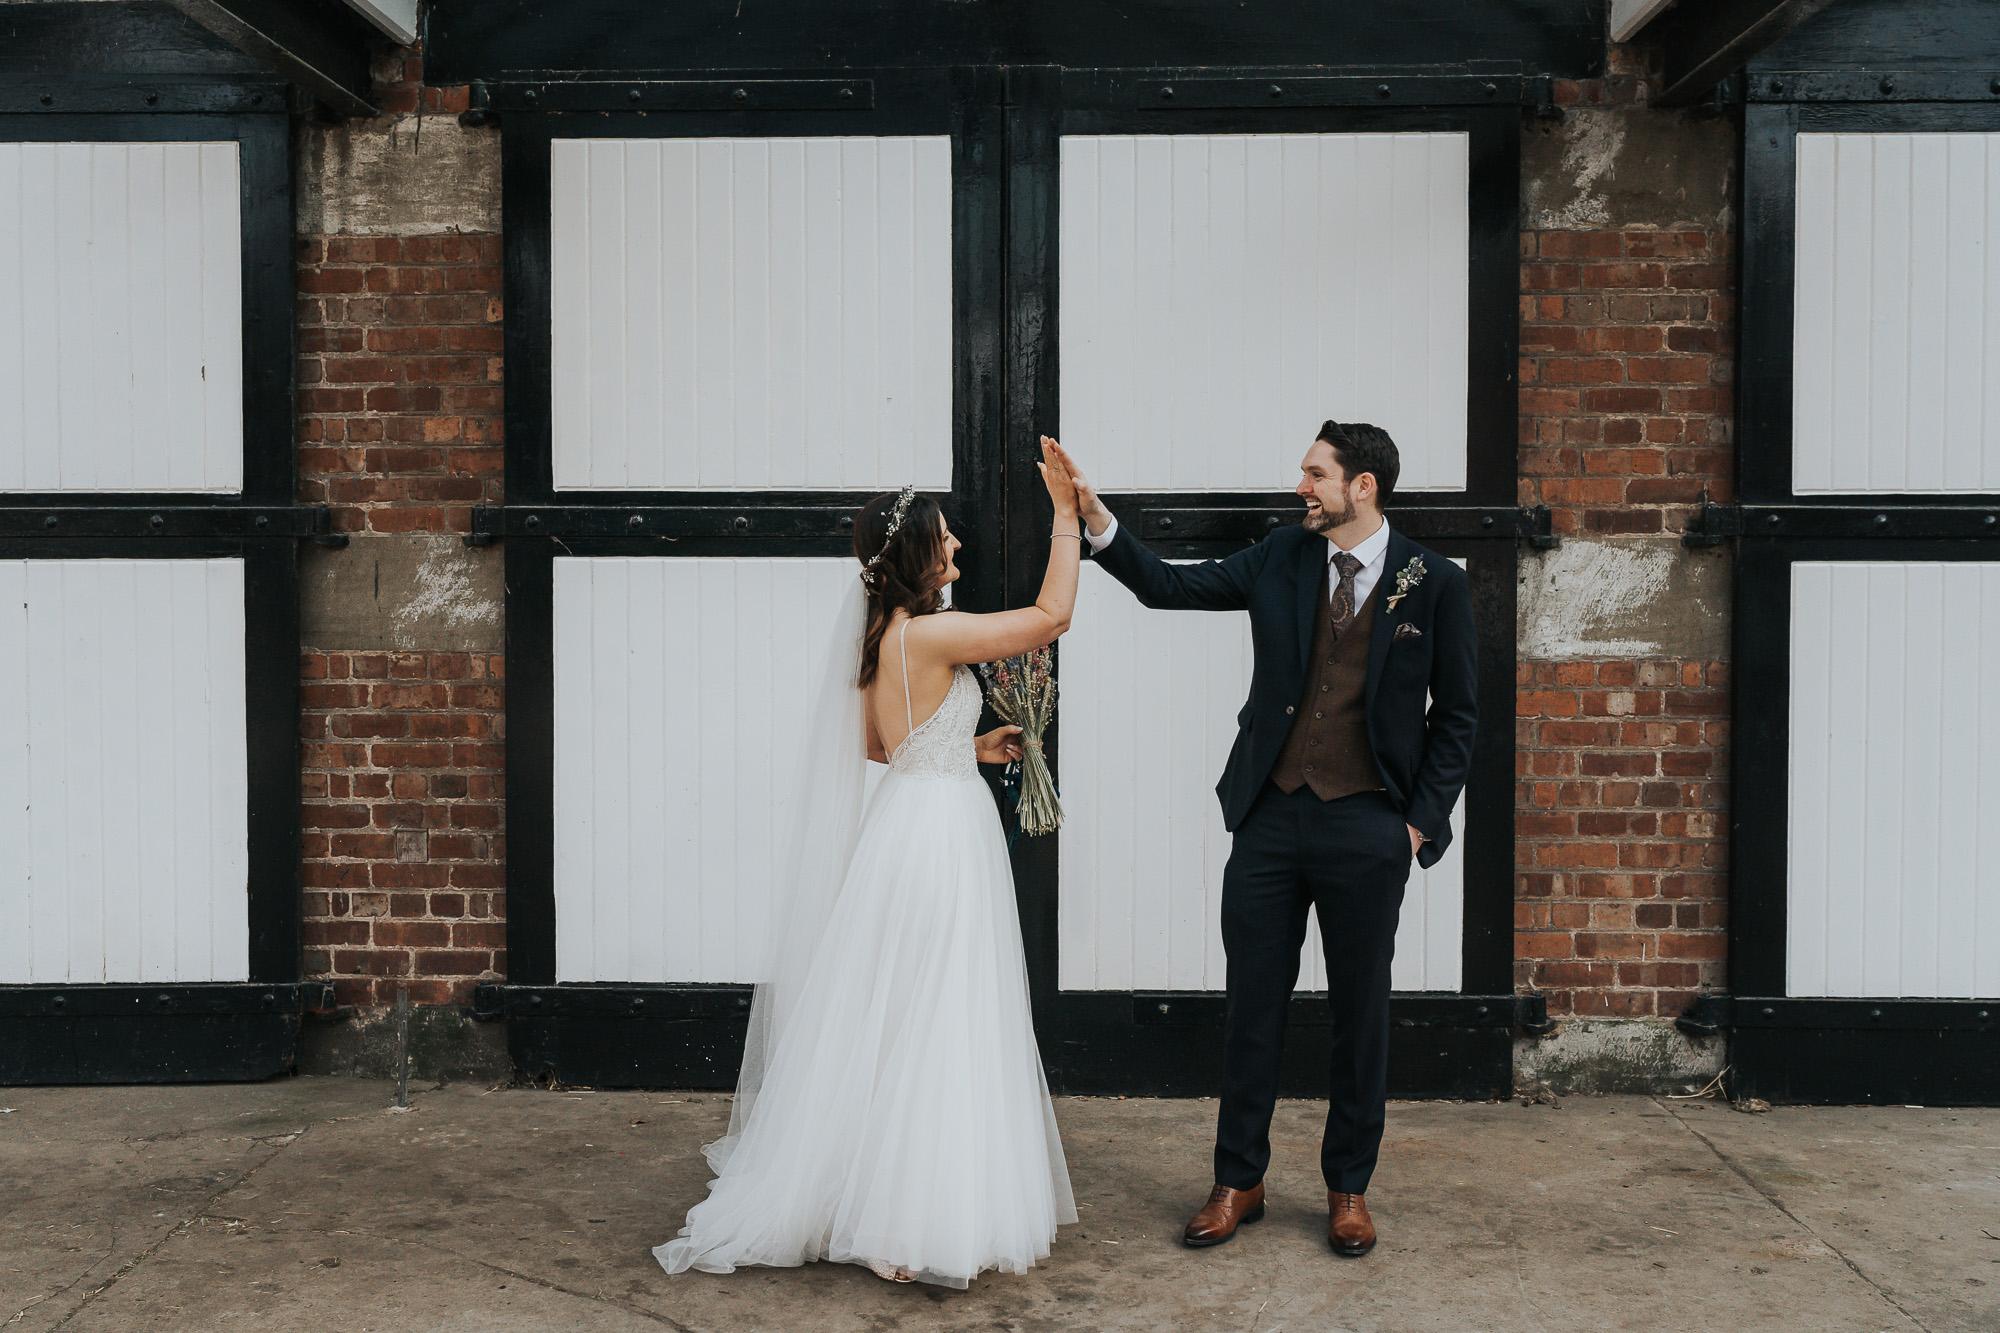 farm wedding in cheshire wedding photographer based in liverpool  (19 of 36).jpg